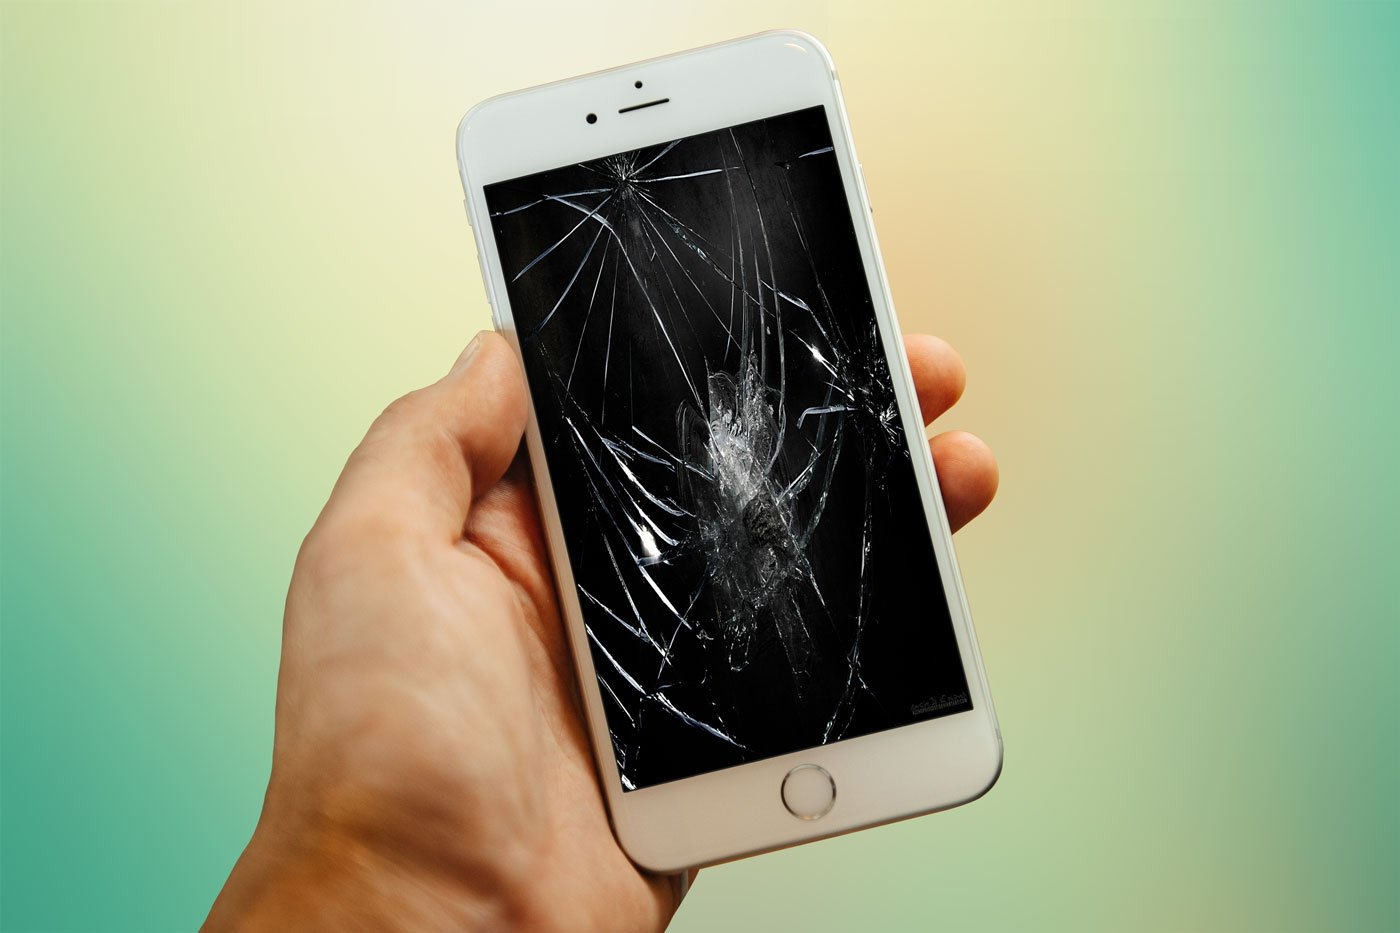 servis ganti kaca iphone